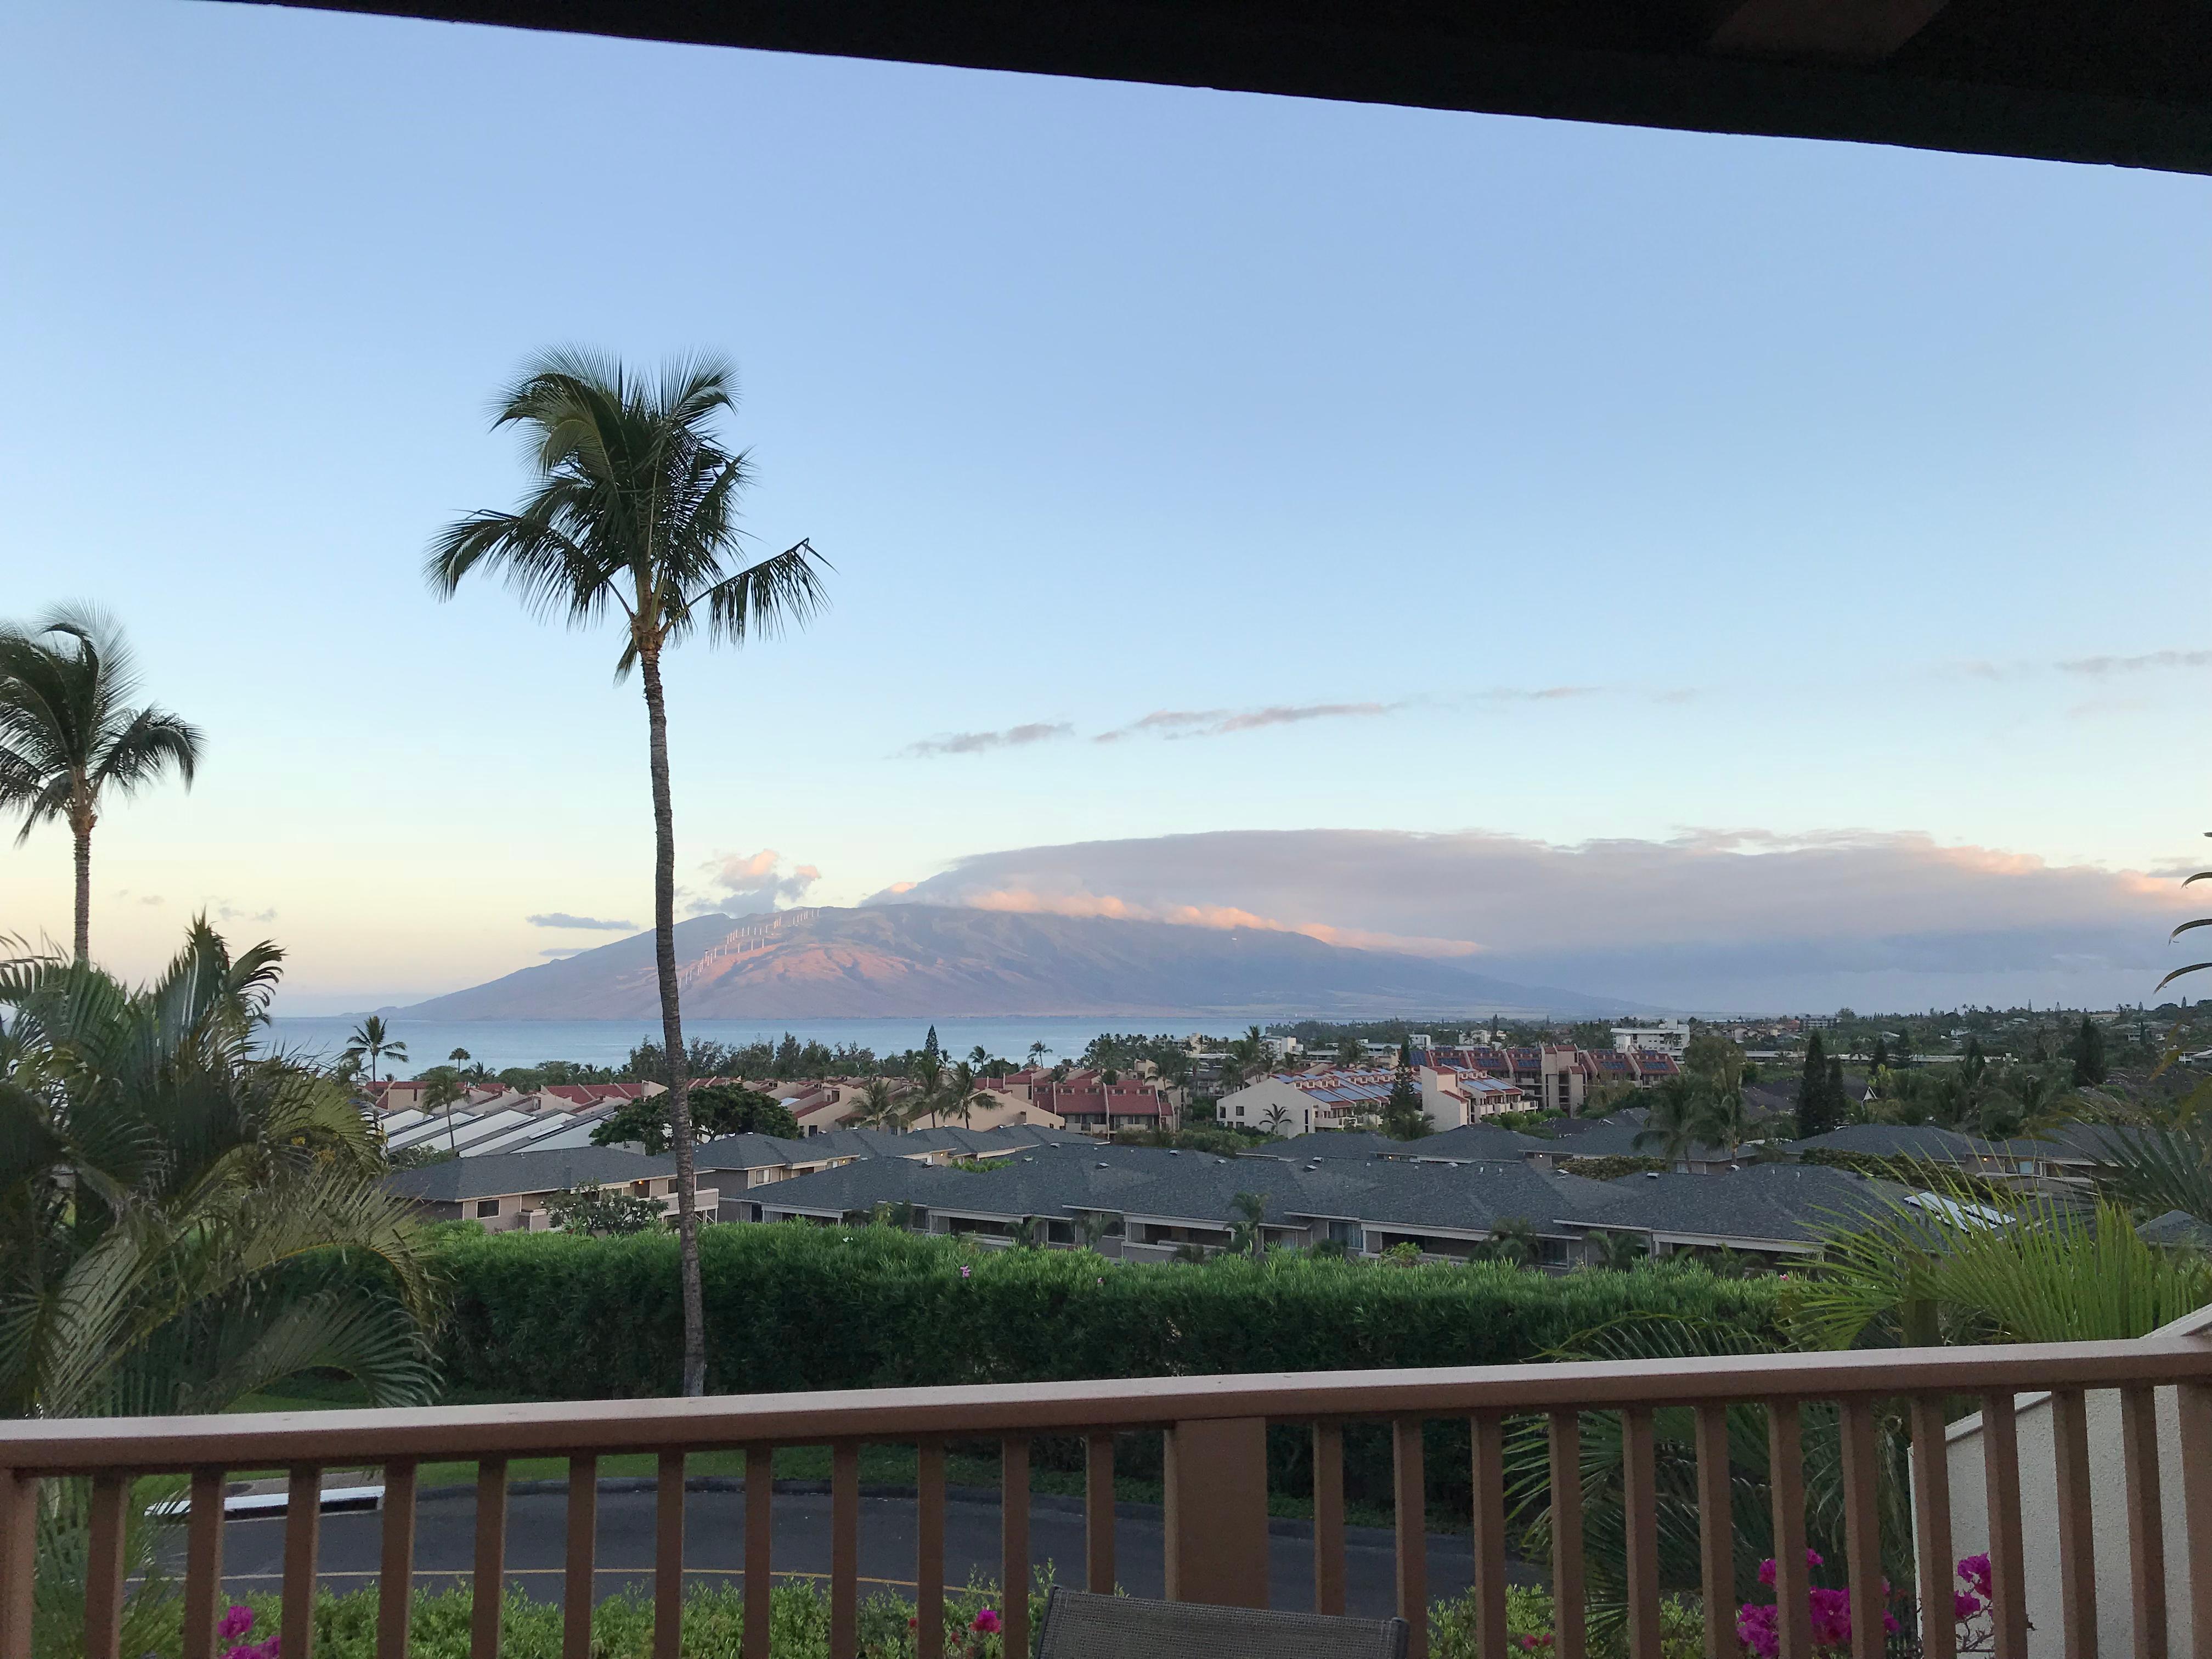 Maui Kamaole By Crh In Kihei Hotel Rates Amp Reviews On Orbitz